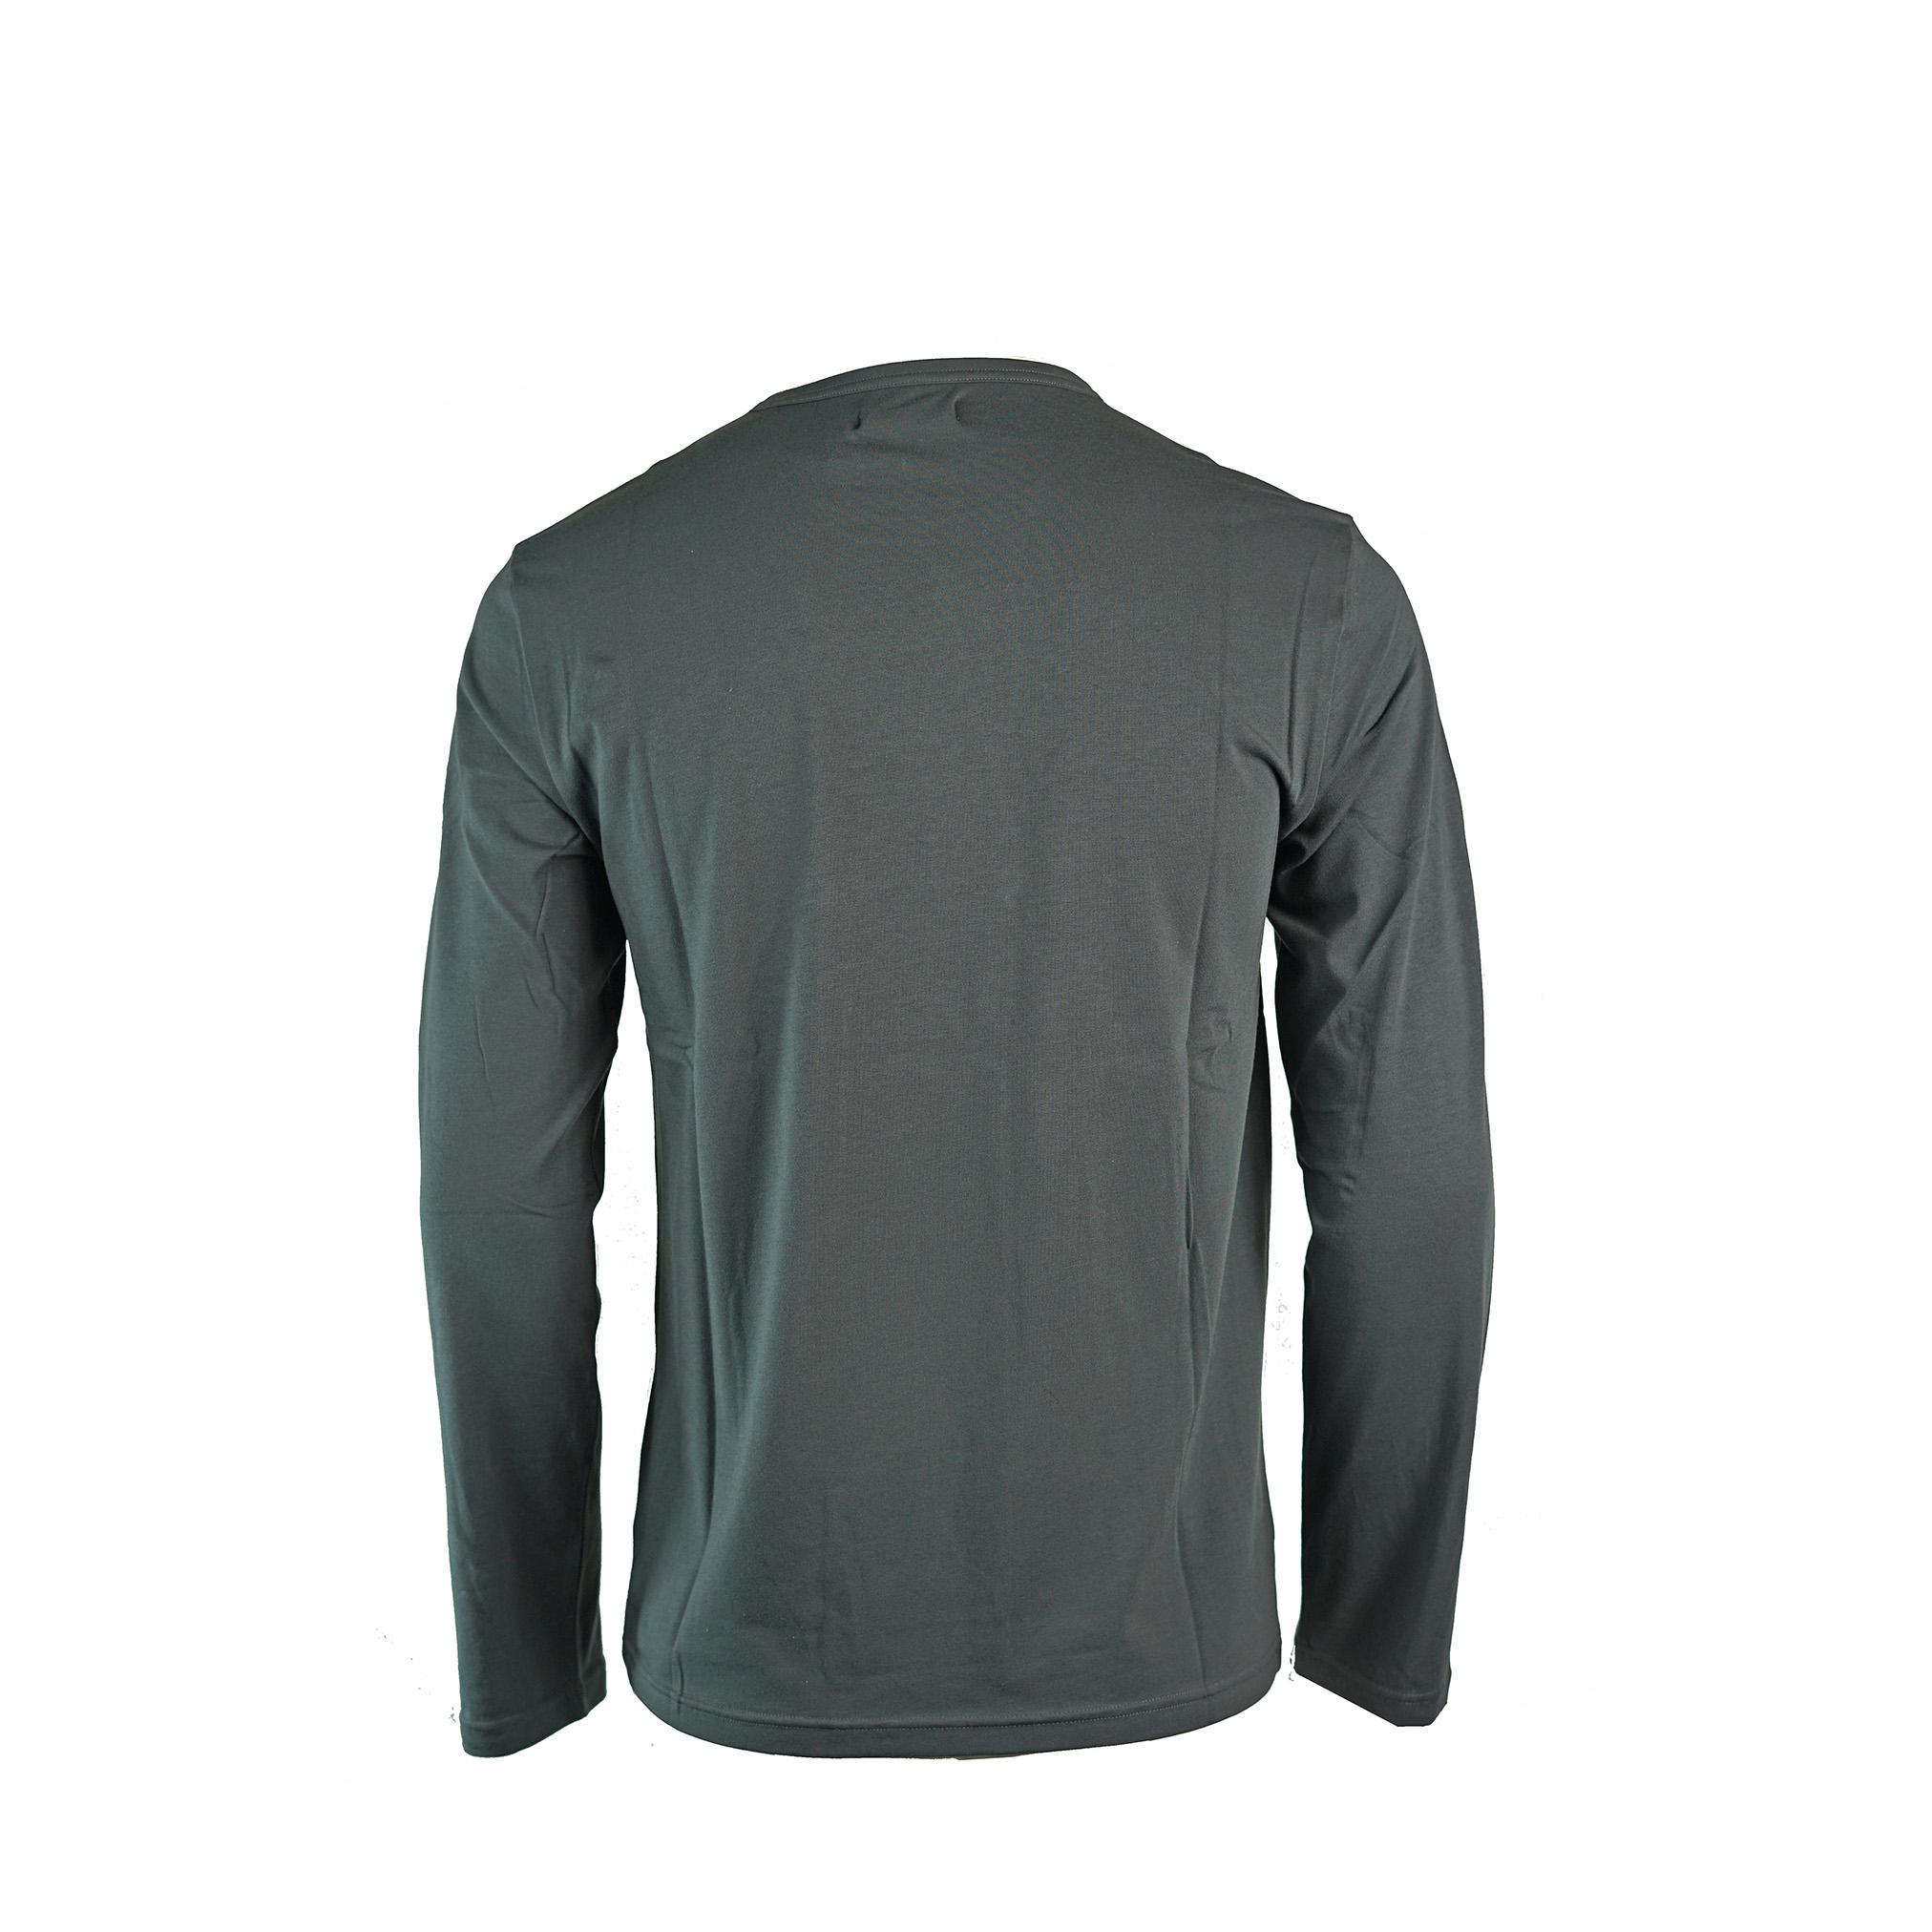 Emporio-Armani-111653-7A715-08444-T-Shirt thumbnail 2